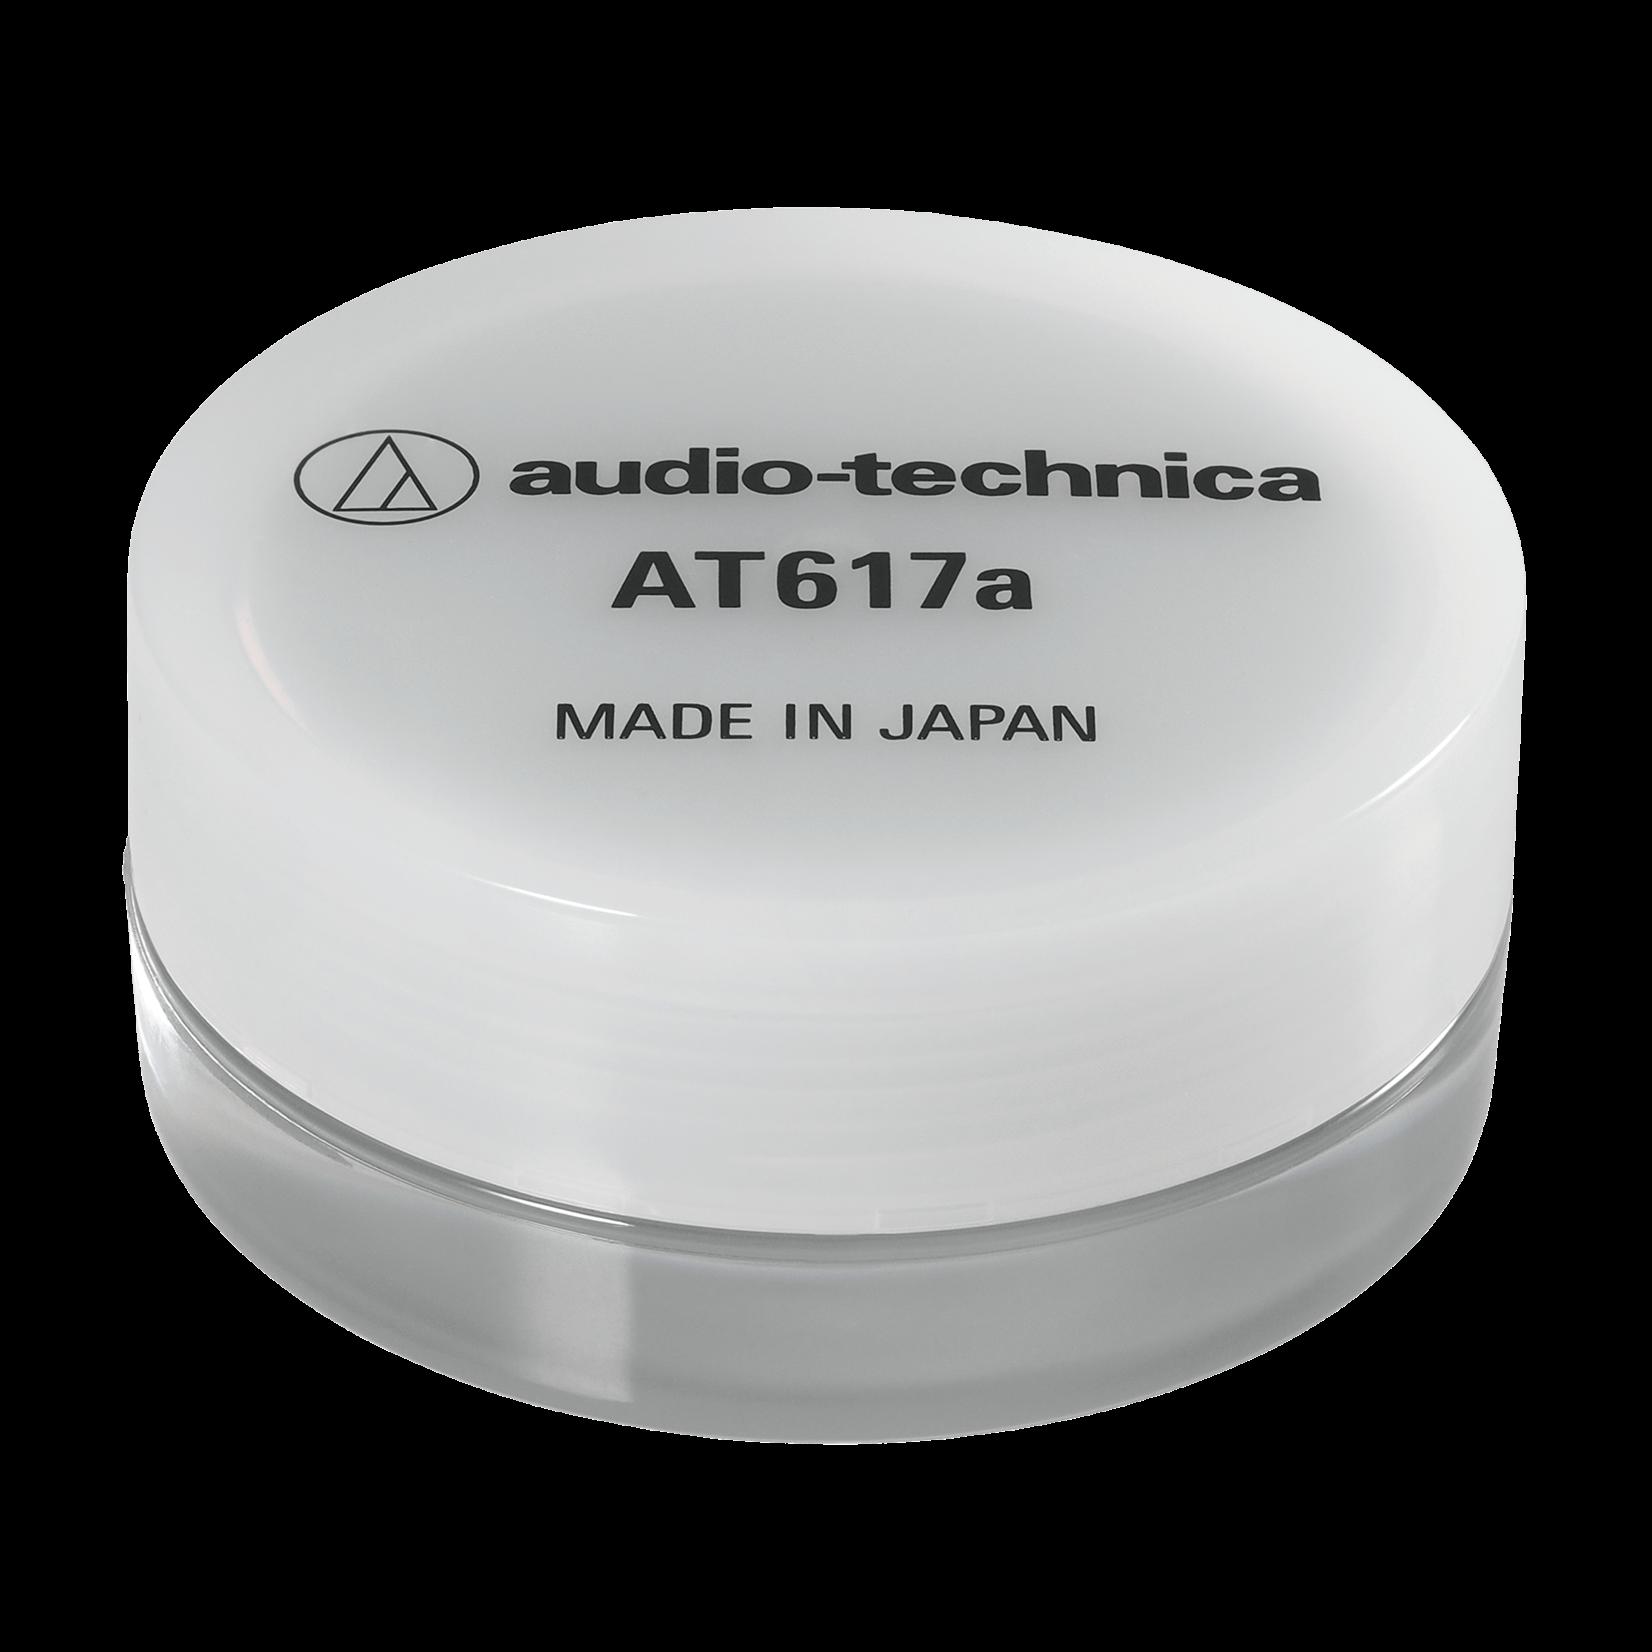 AUDIO-TECHNICA AT617A